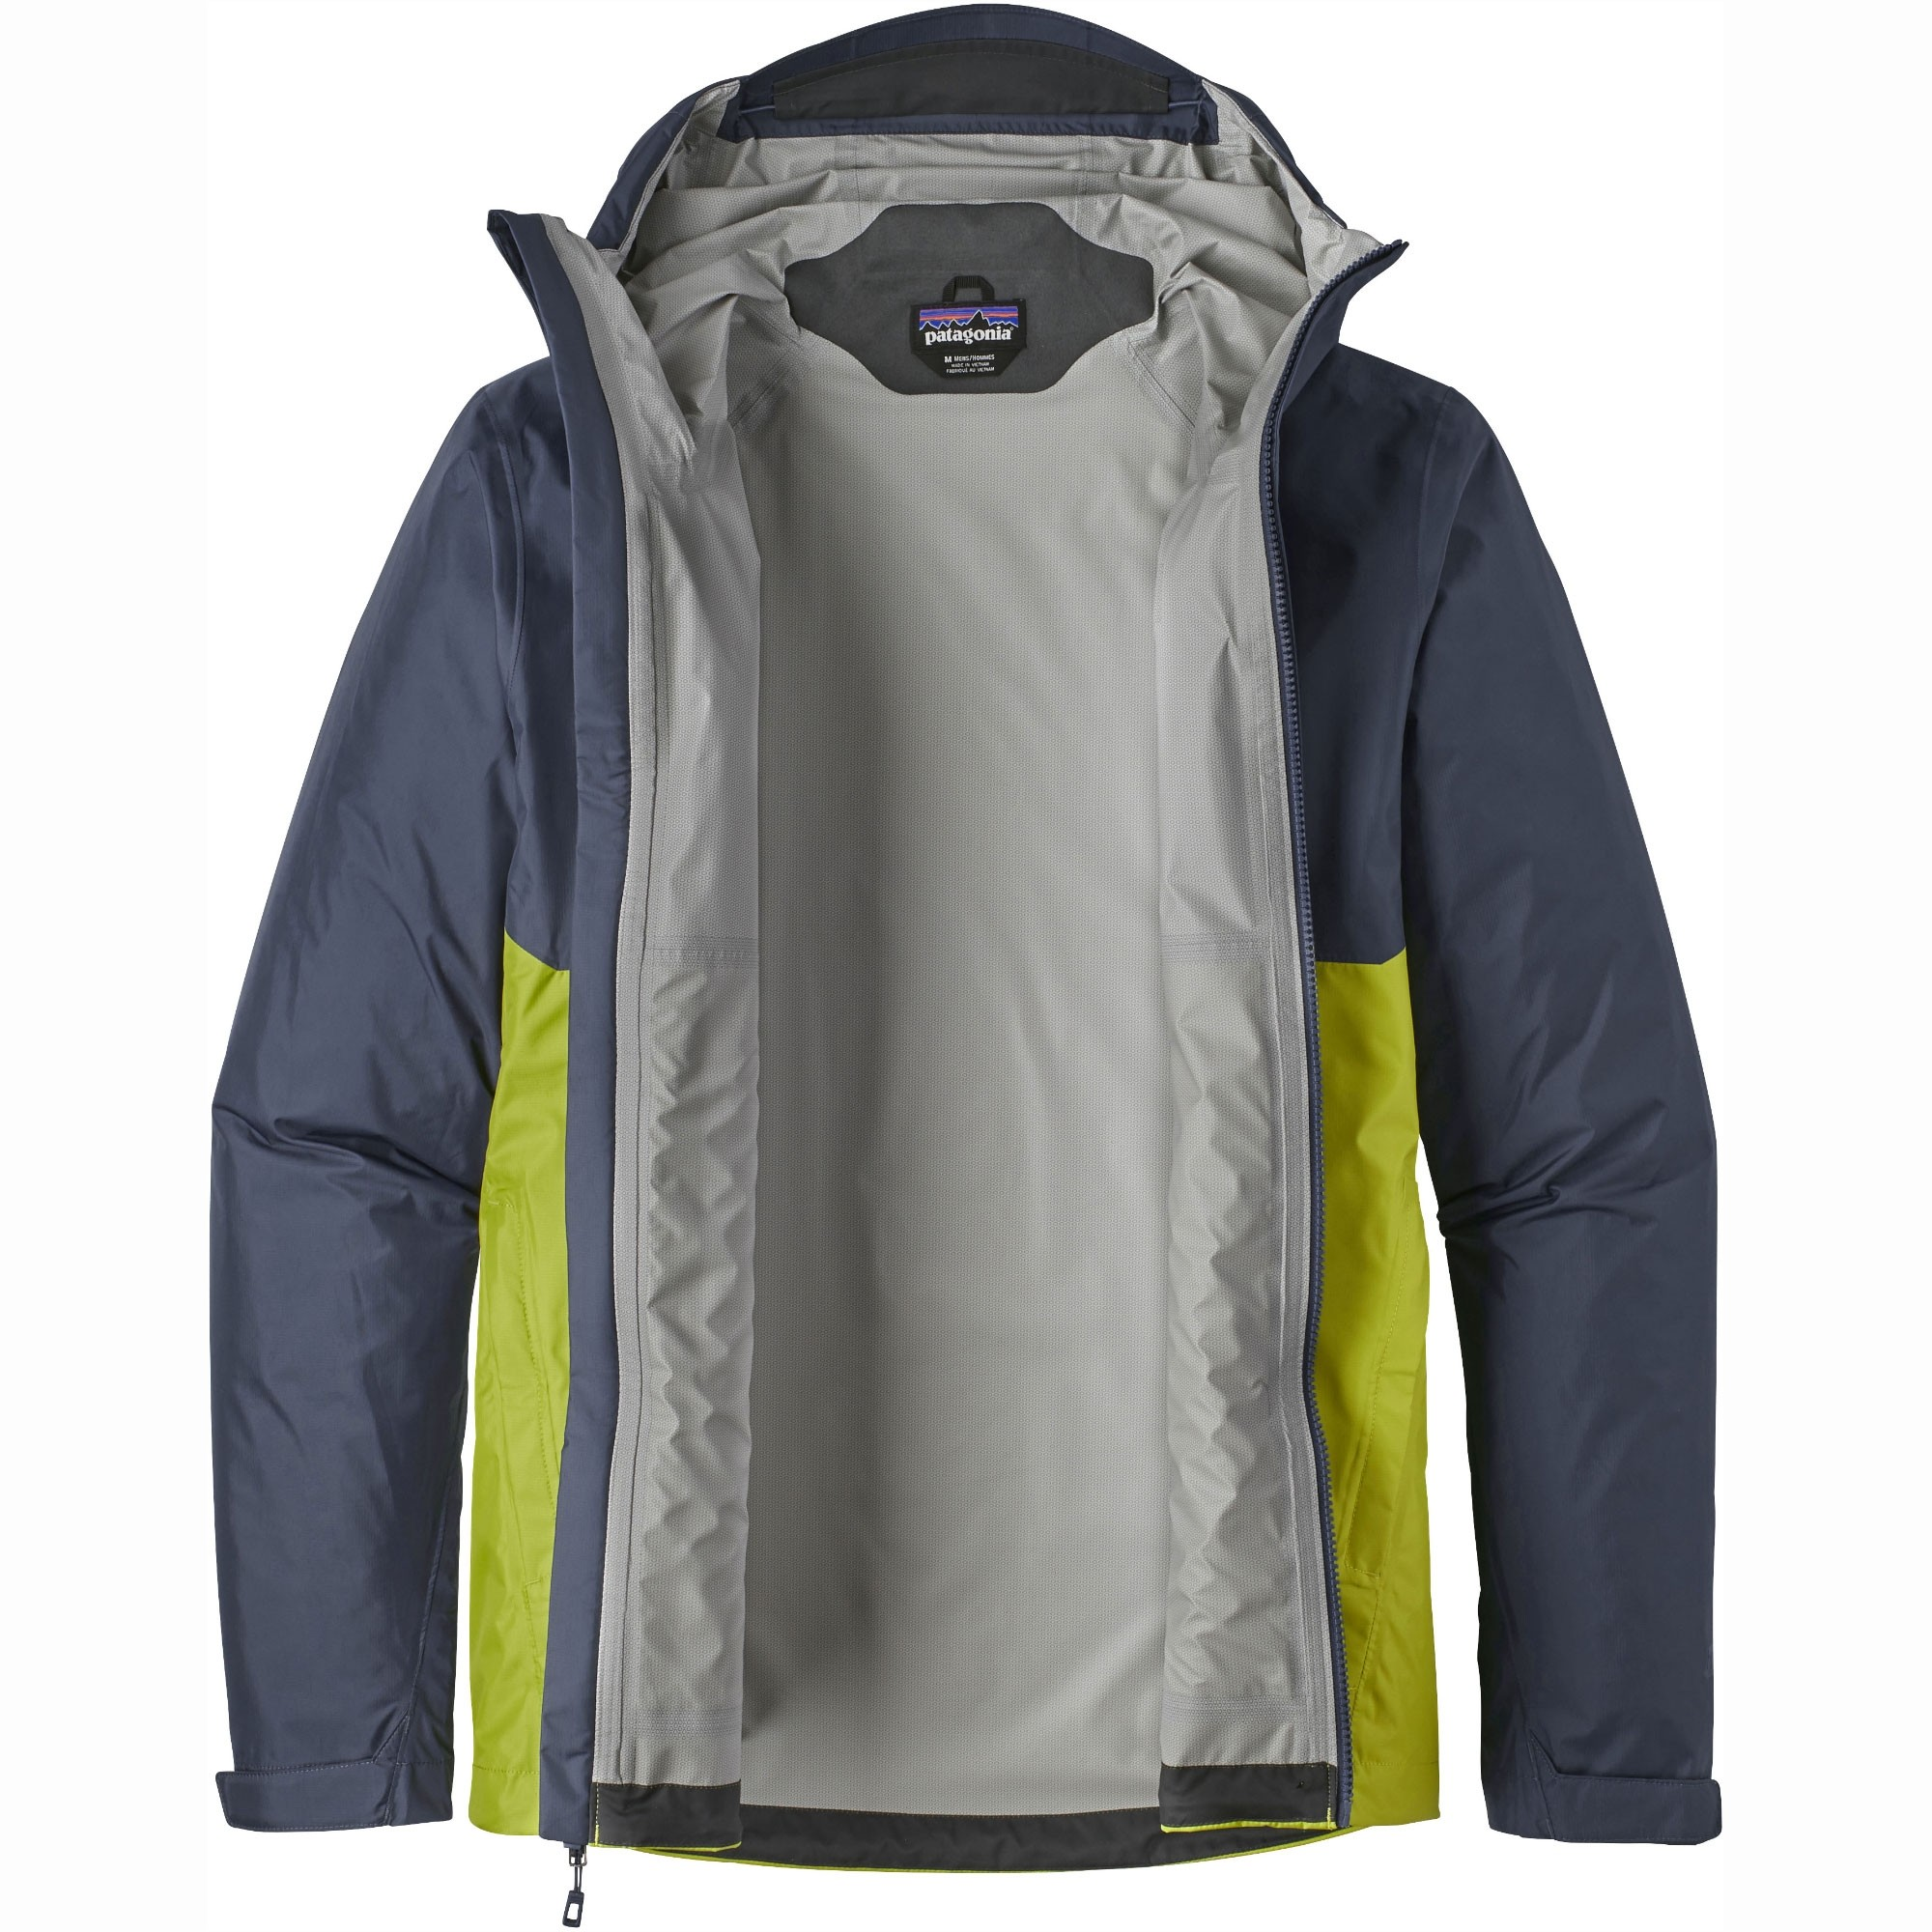 Patagonia-M-Torrentshell-Jacket-Dolomite-Blue-Light-Gecko-Green-OPEN-S18.jpg